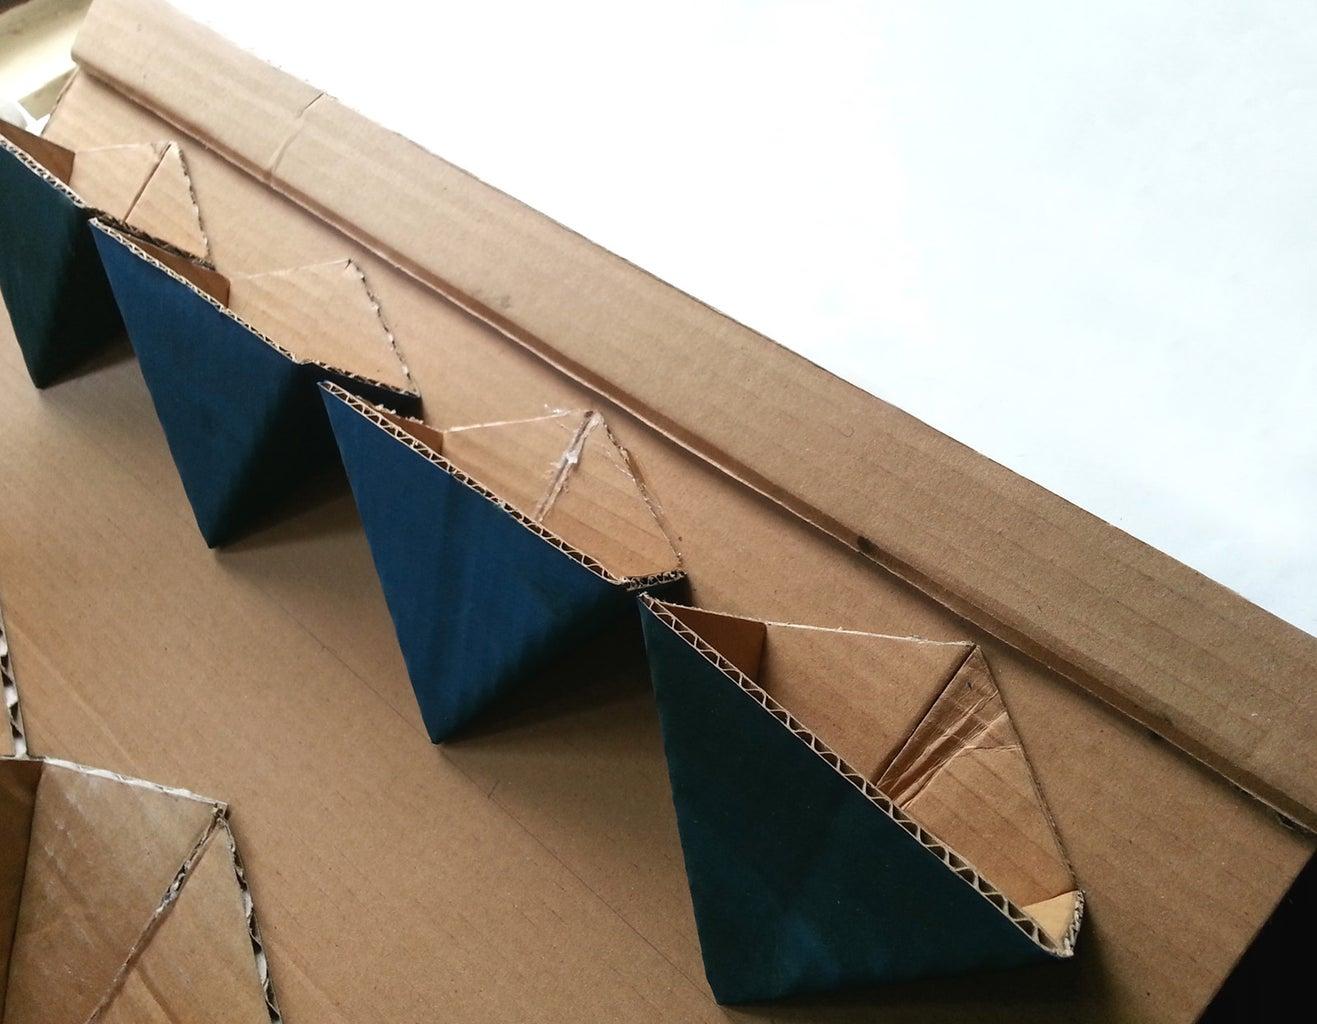 Attaching Hanging Mechanism